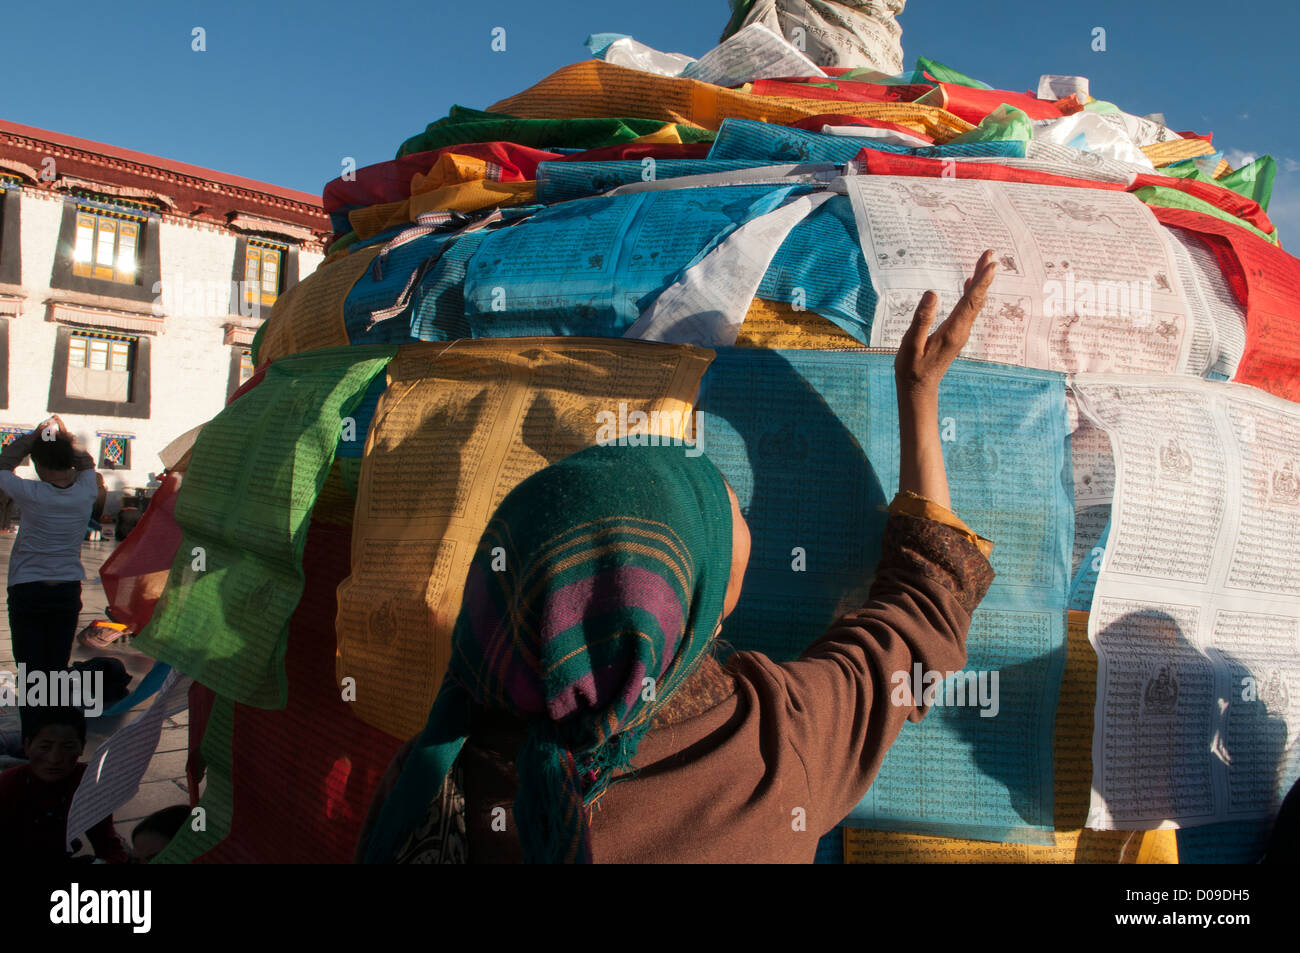 Prayer flags cover pagoda as pilgrims pray at Jokhang Temple on Barkhor Square at sunset, Lhasa, Tibet, China - Stock Image